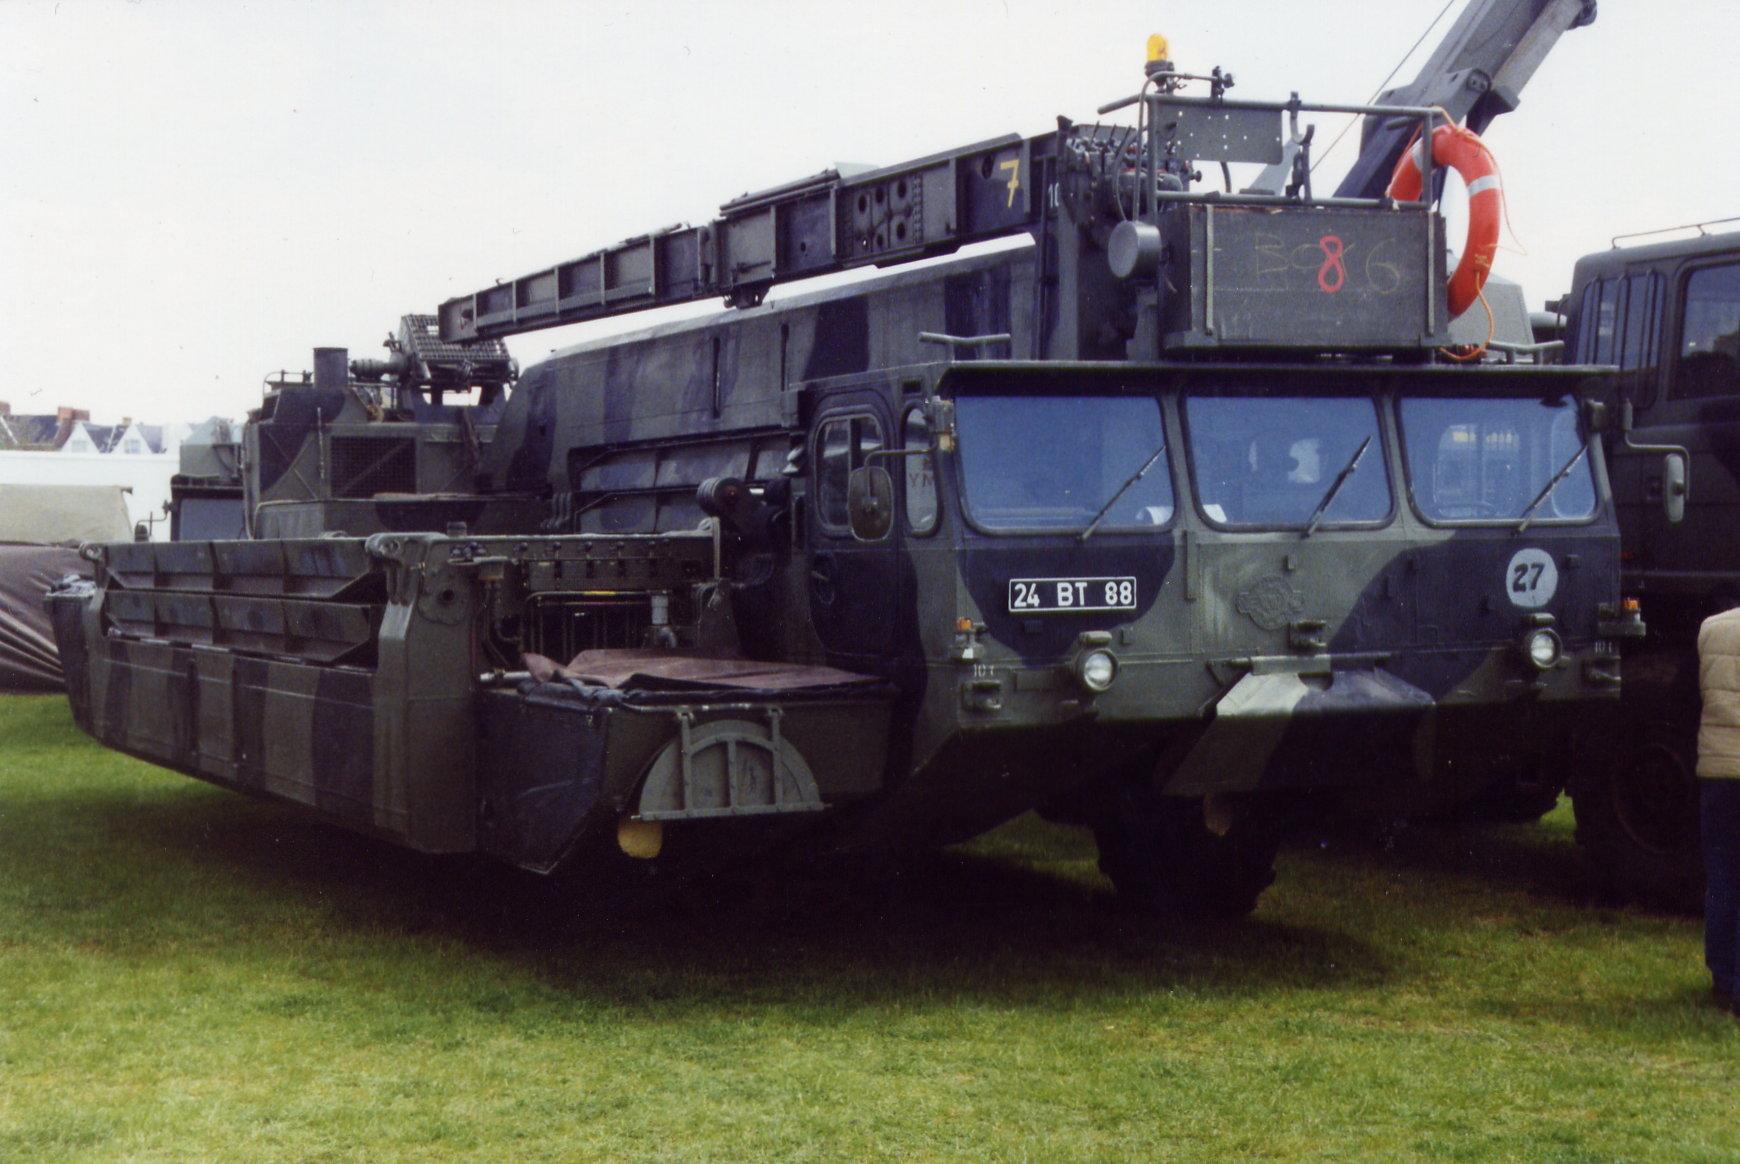 EWK-KHD M2 Alligator Amphibious Bridging-Ferrying Vehicle (24 BT 88) 2